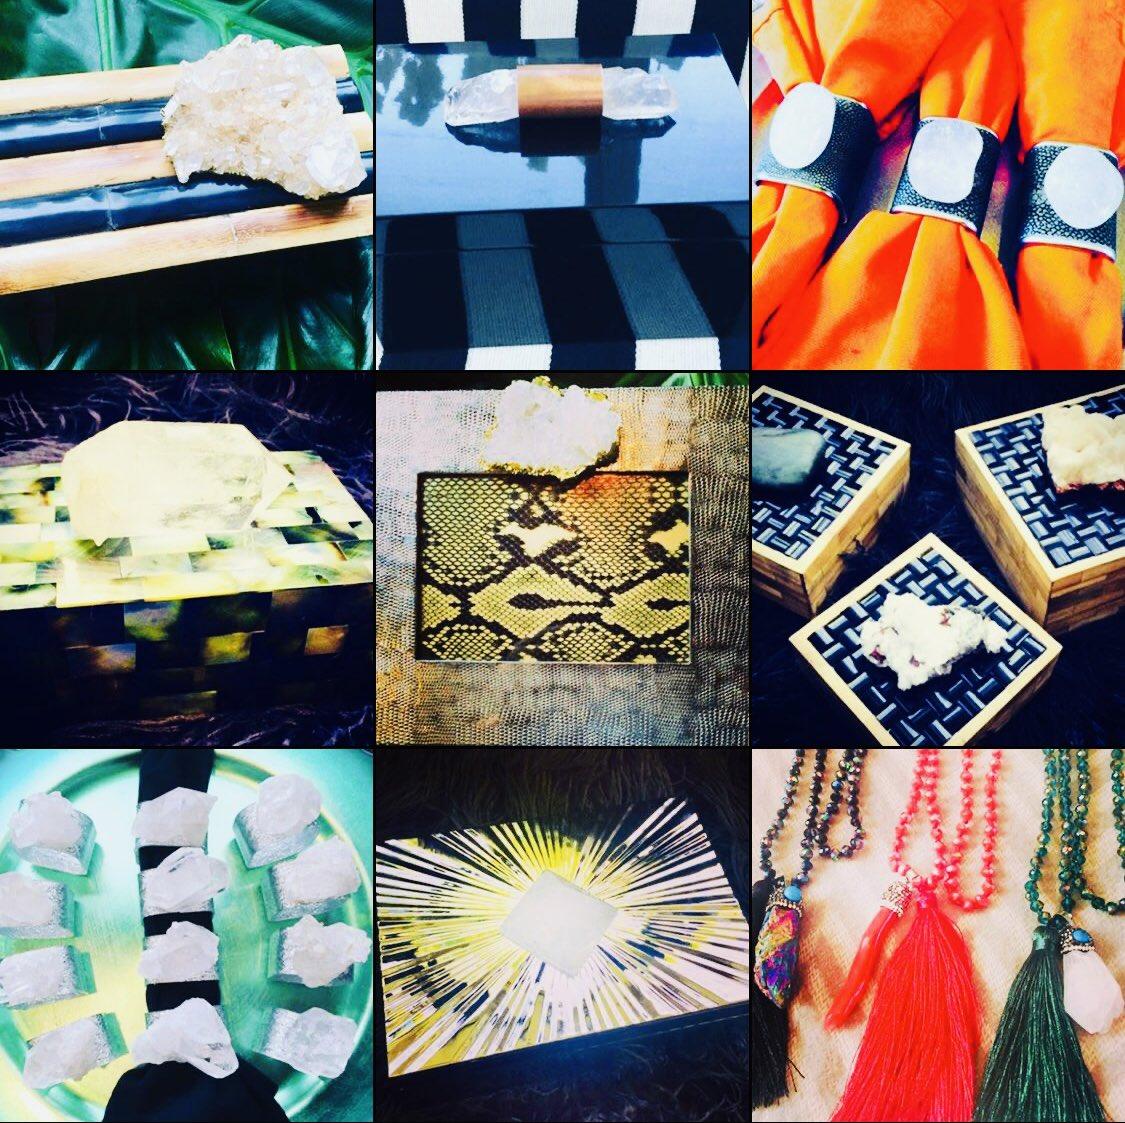 """Quartz enhances spiritual growth, spirituality, awareness, and wisdom."" Explore our unique handmade creations utilizing powerful quartz stones at (link in bio): http://www.JesseDimondDesign.etsy.com!#healing #quartz #stone #crystal #bohostyle #bohochic #decor #decoration #design #designerpic.twitter.com/Zc4ZIG3Eak"